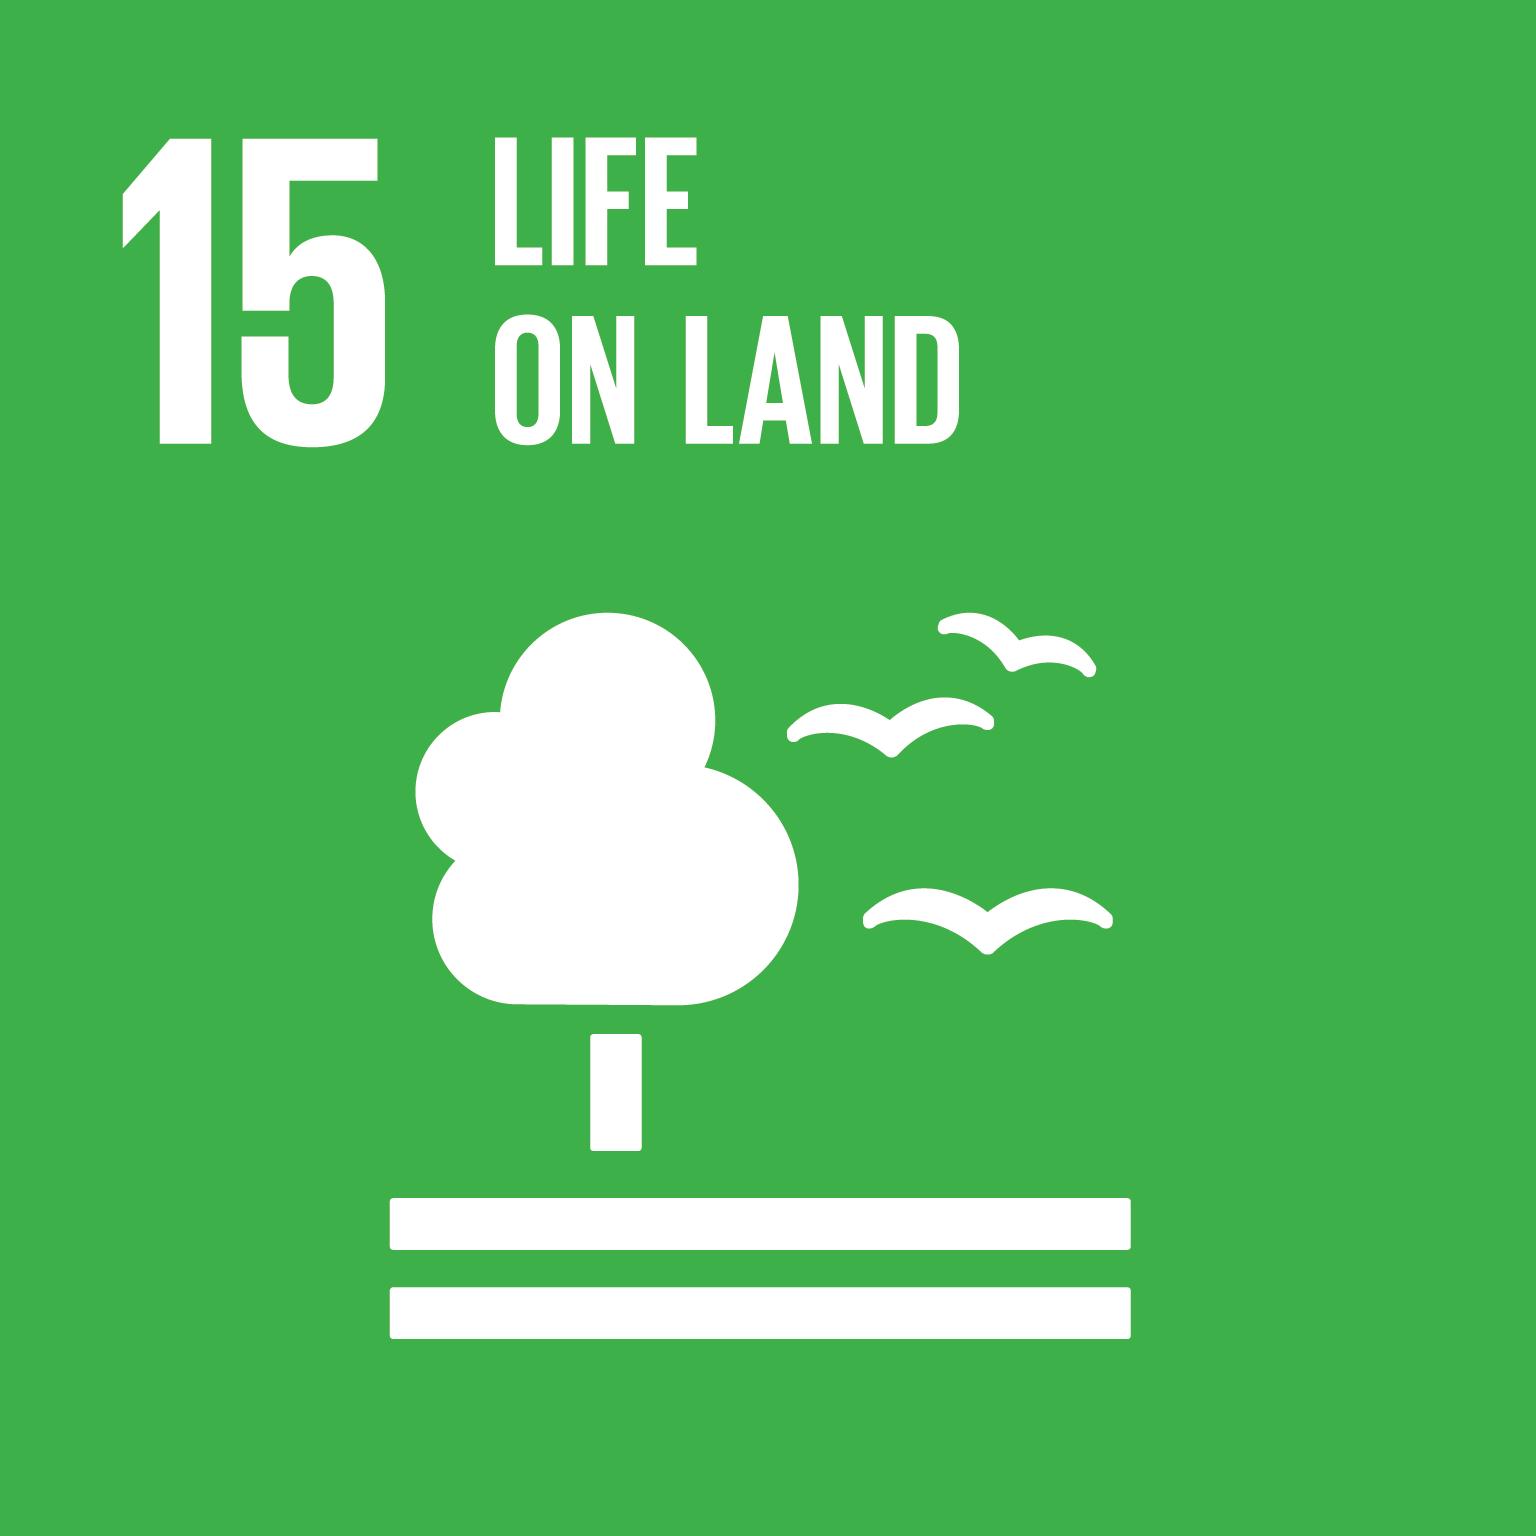 SDG 15: Life On Land